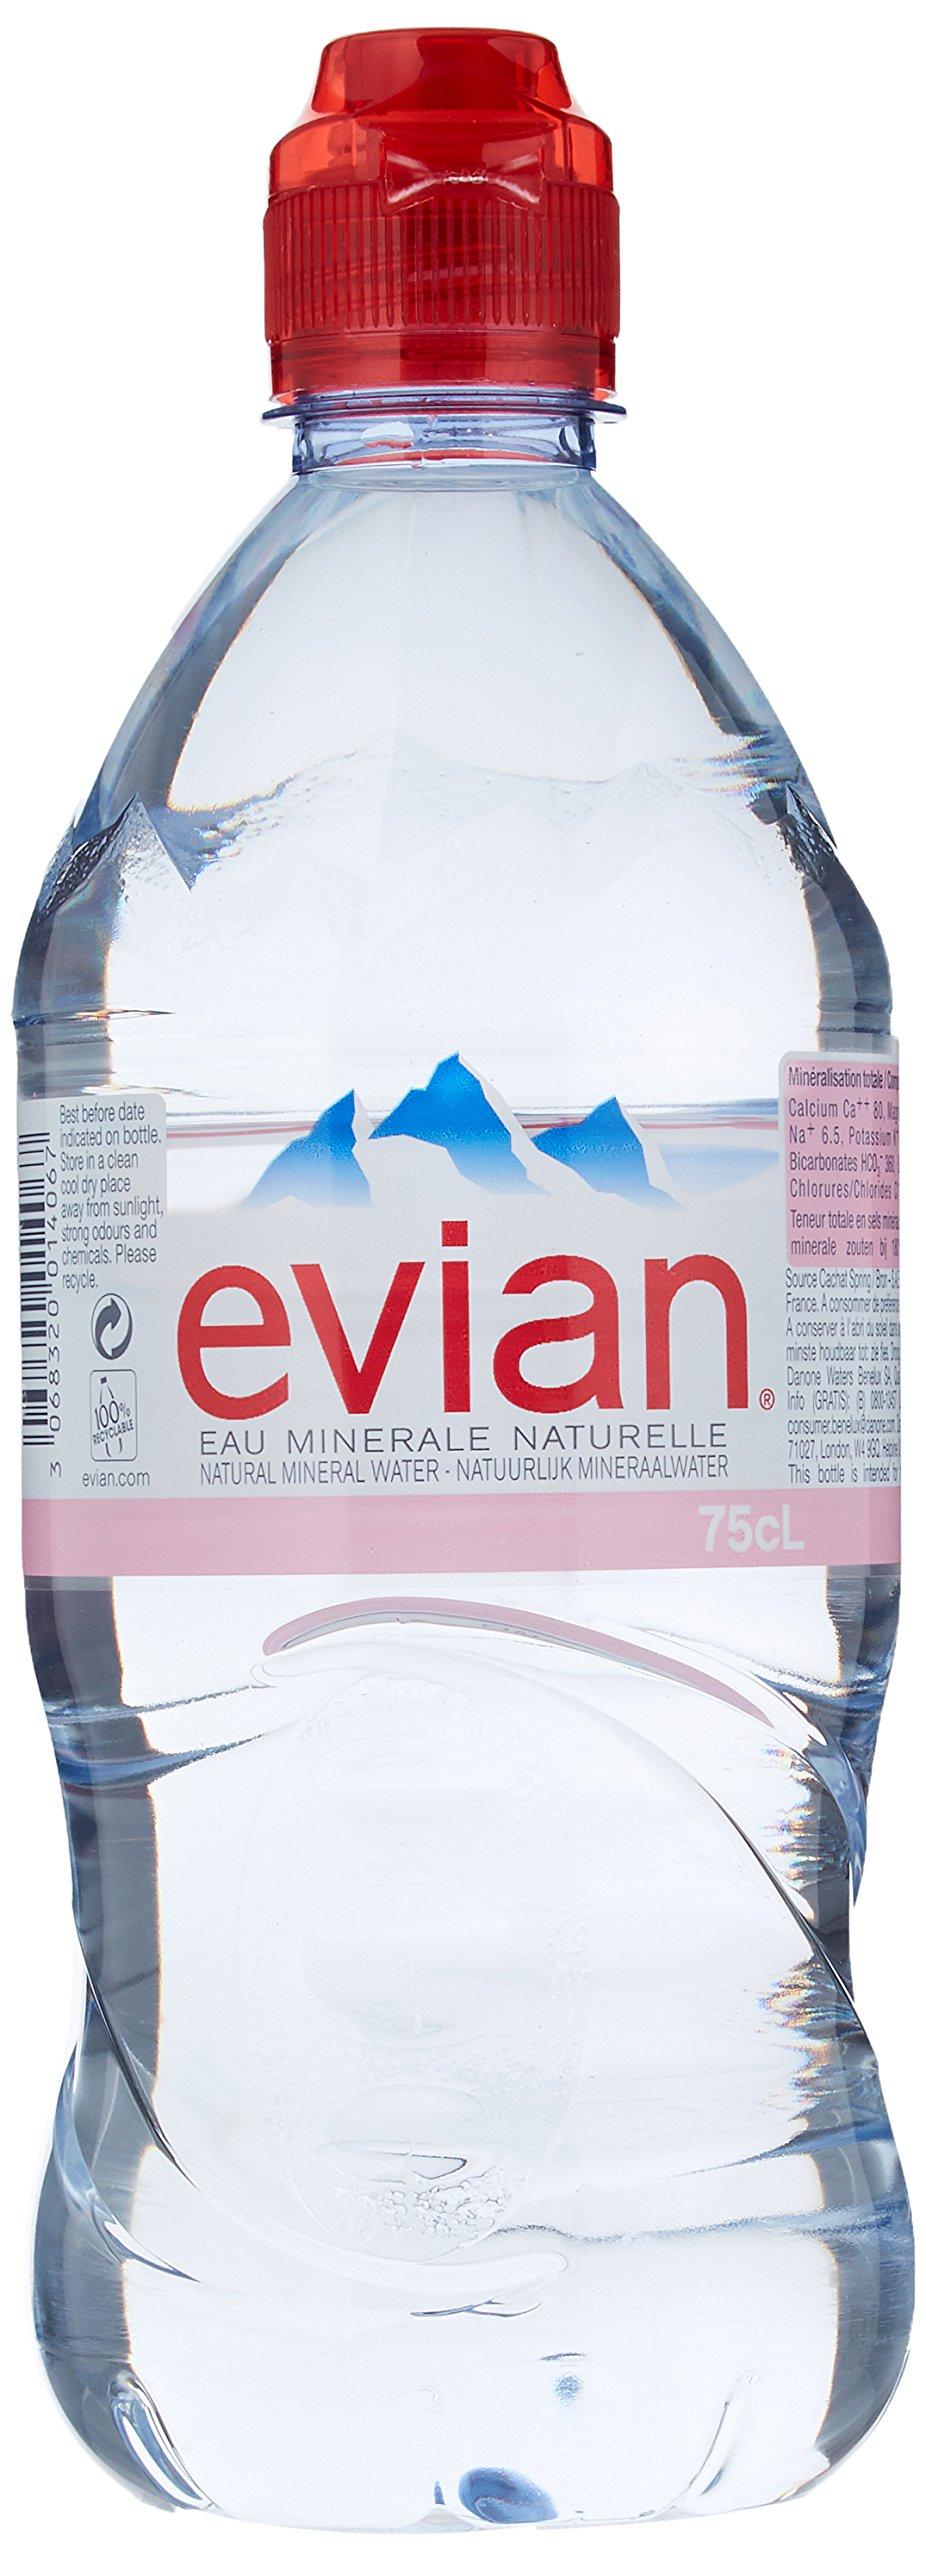 Evian Sportscap Mineral Water 12 Bottles 750 ml (Pack of 2, Total 24 Bottles)